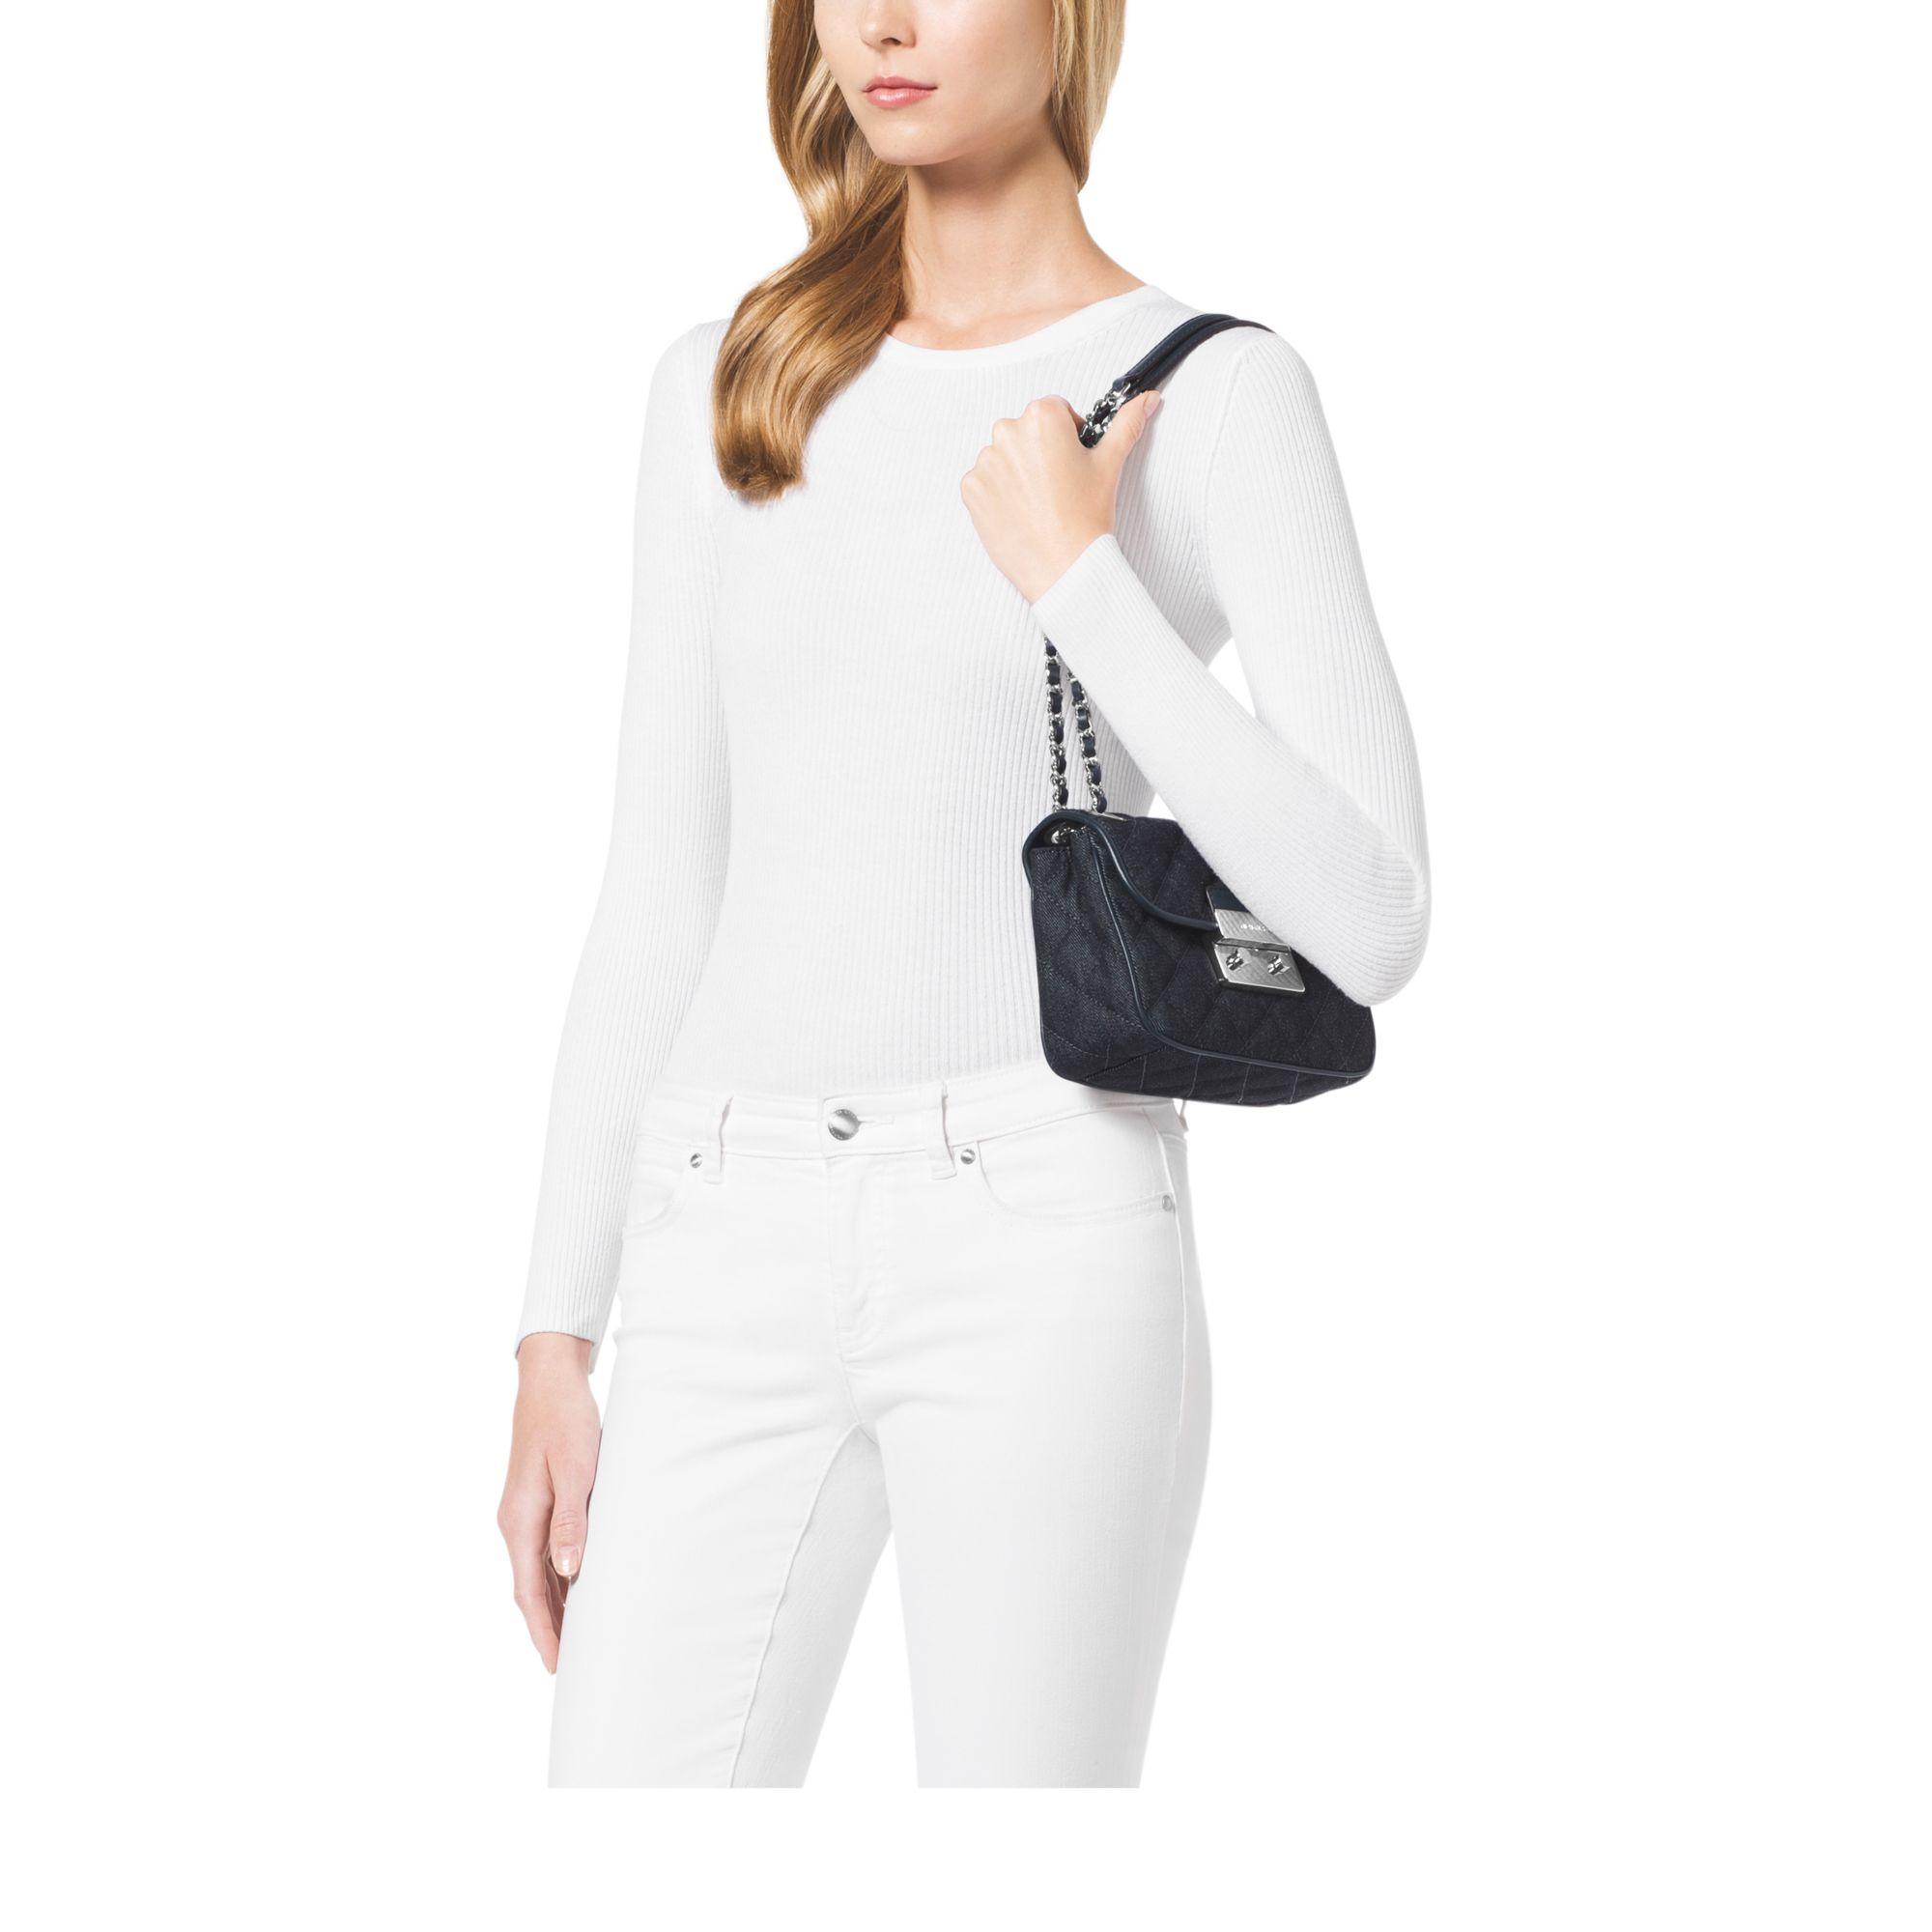 4e86d1b92ed1 Lyst - Michael Kors Sloan Small Quilted-denim Shoulder Bag in Blue